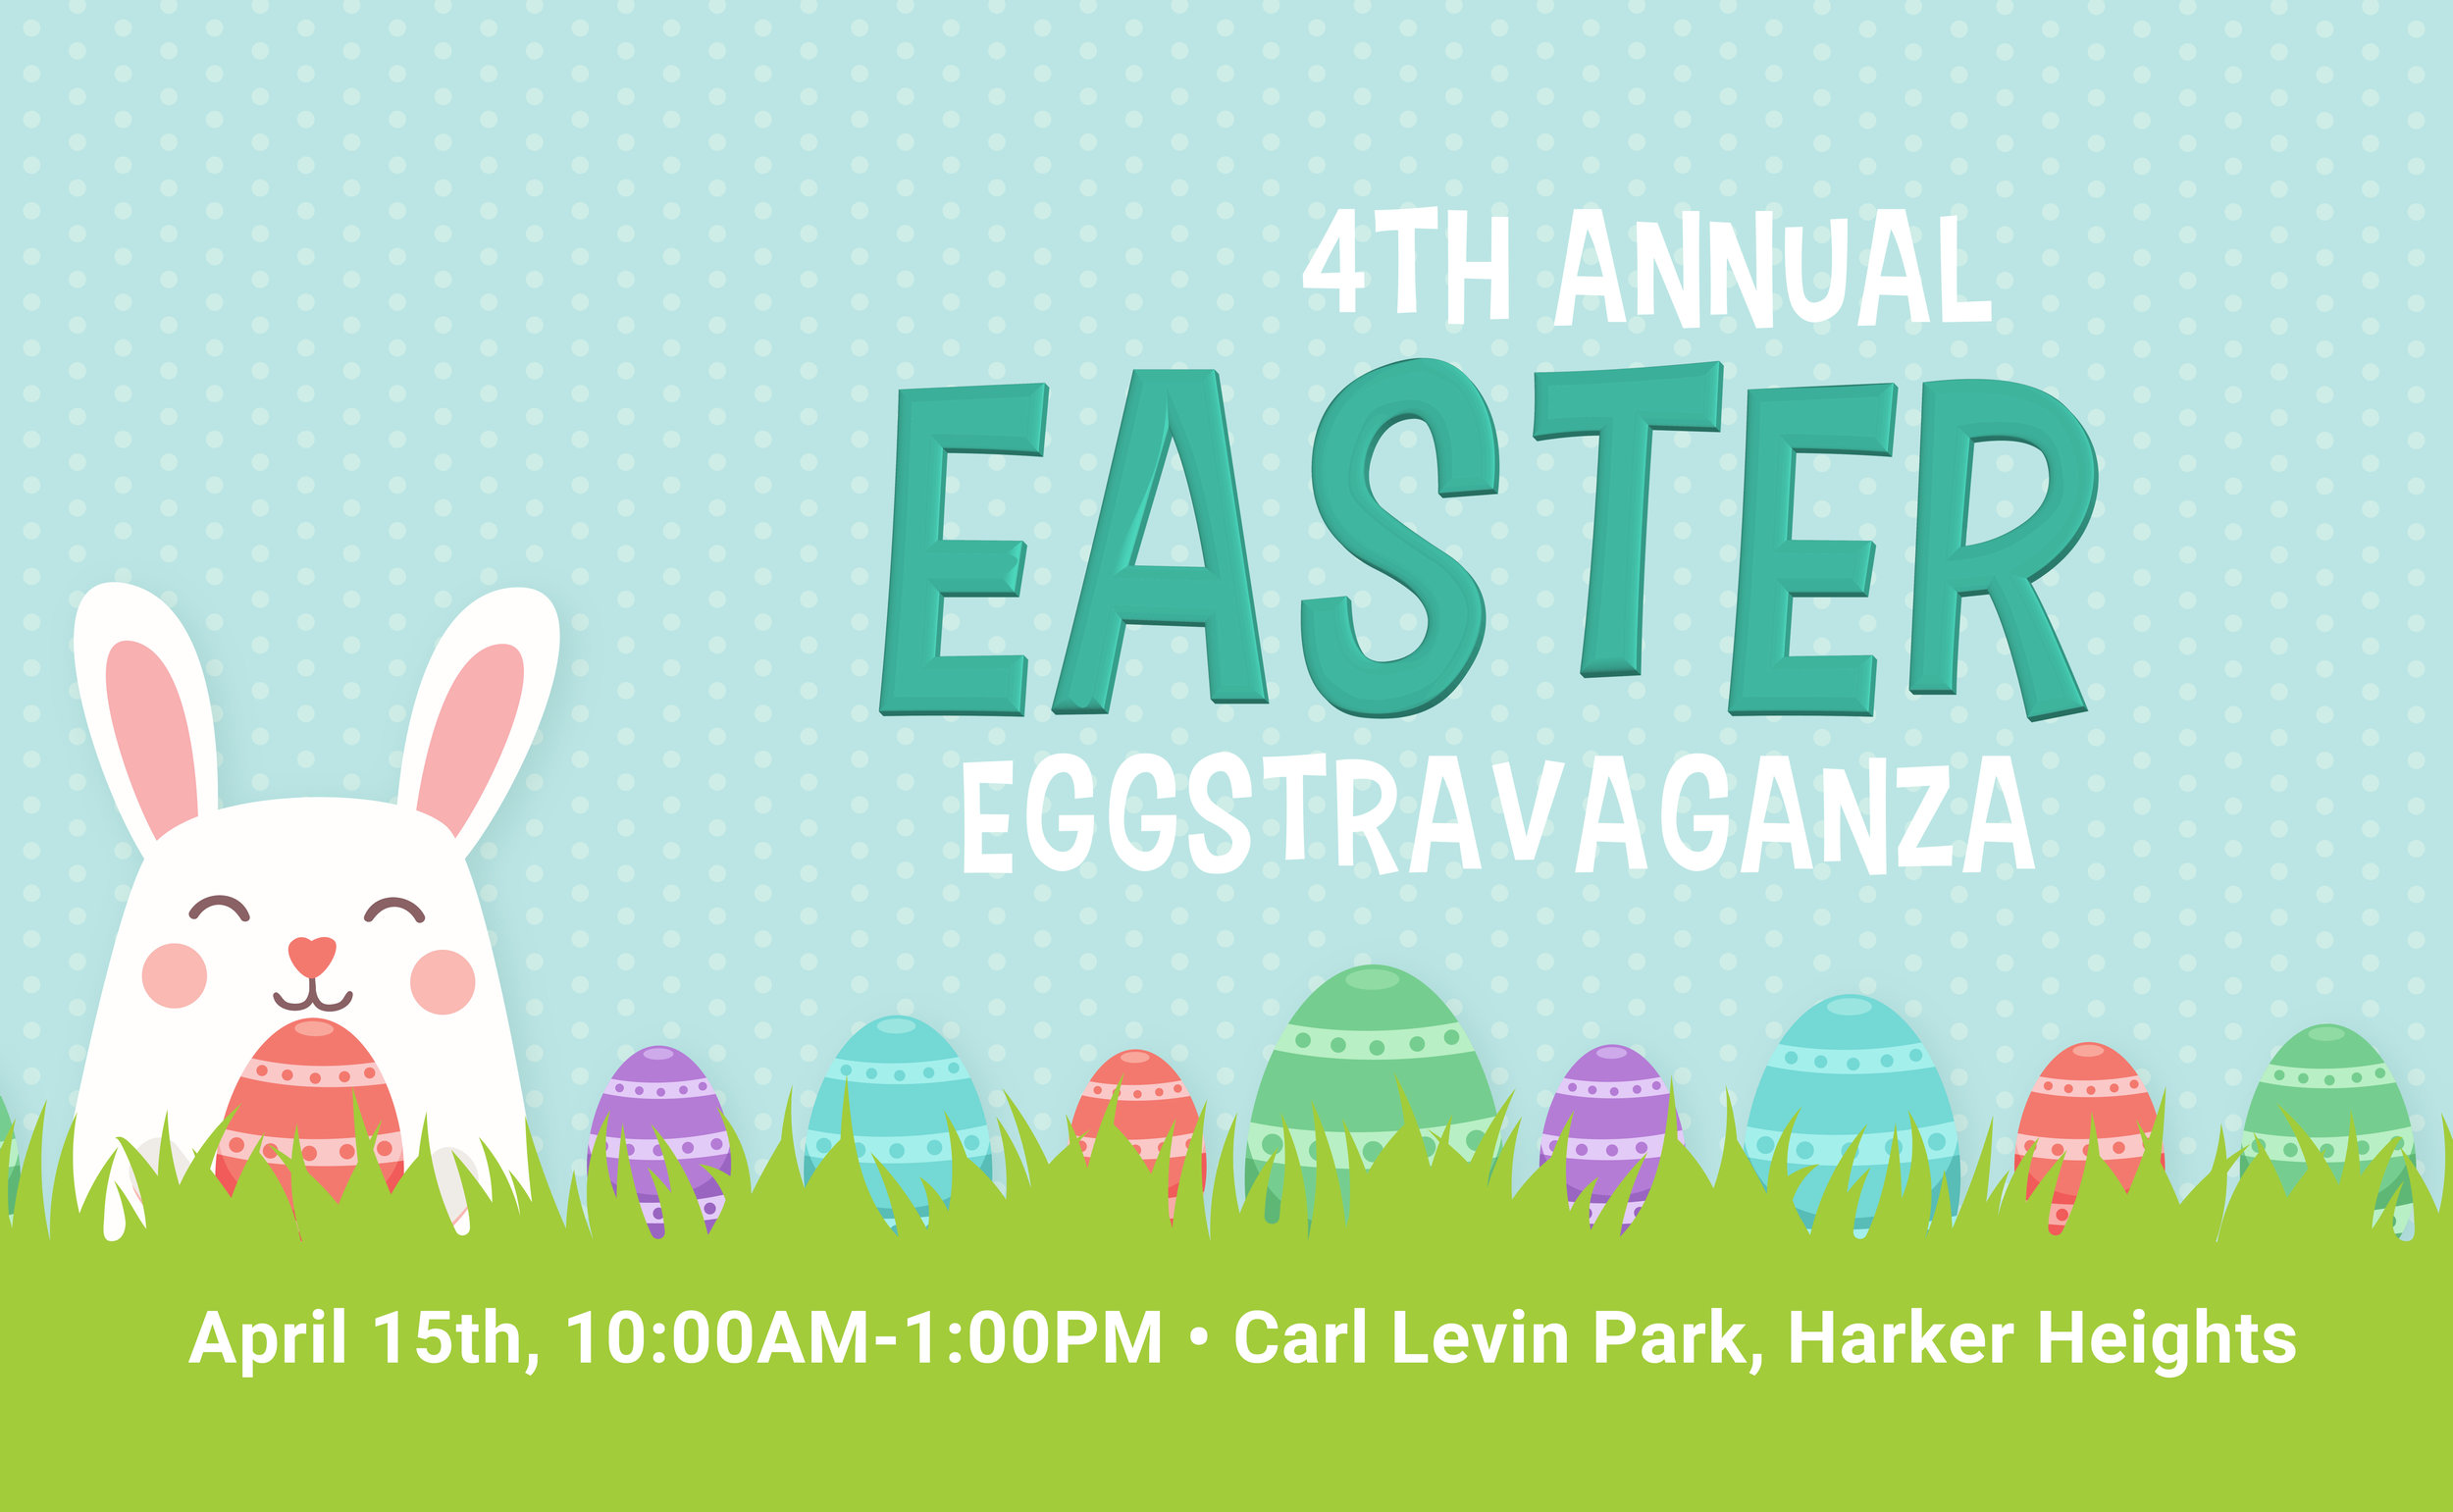 Easter Eggstravaganza - Graphics